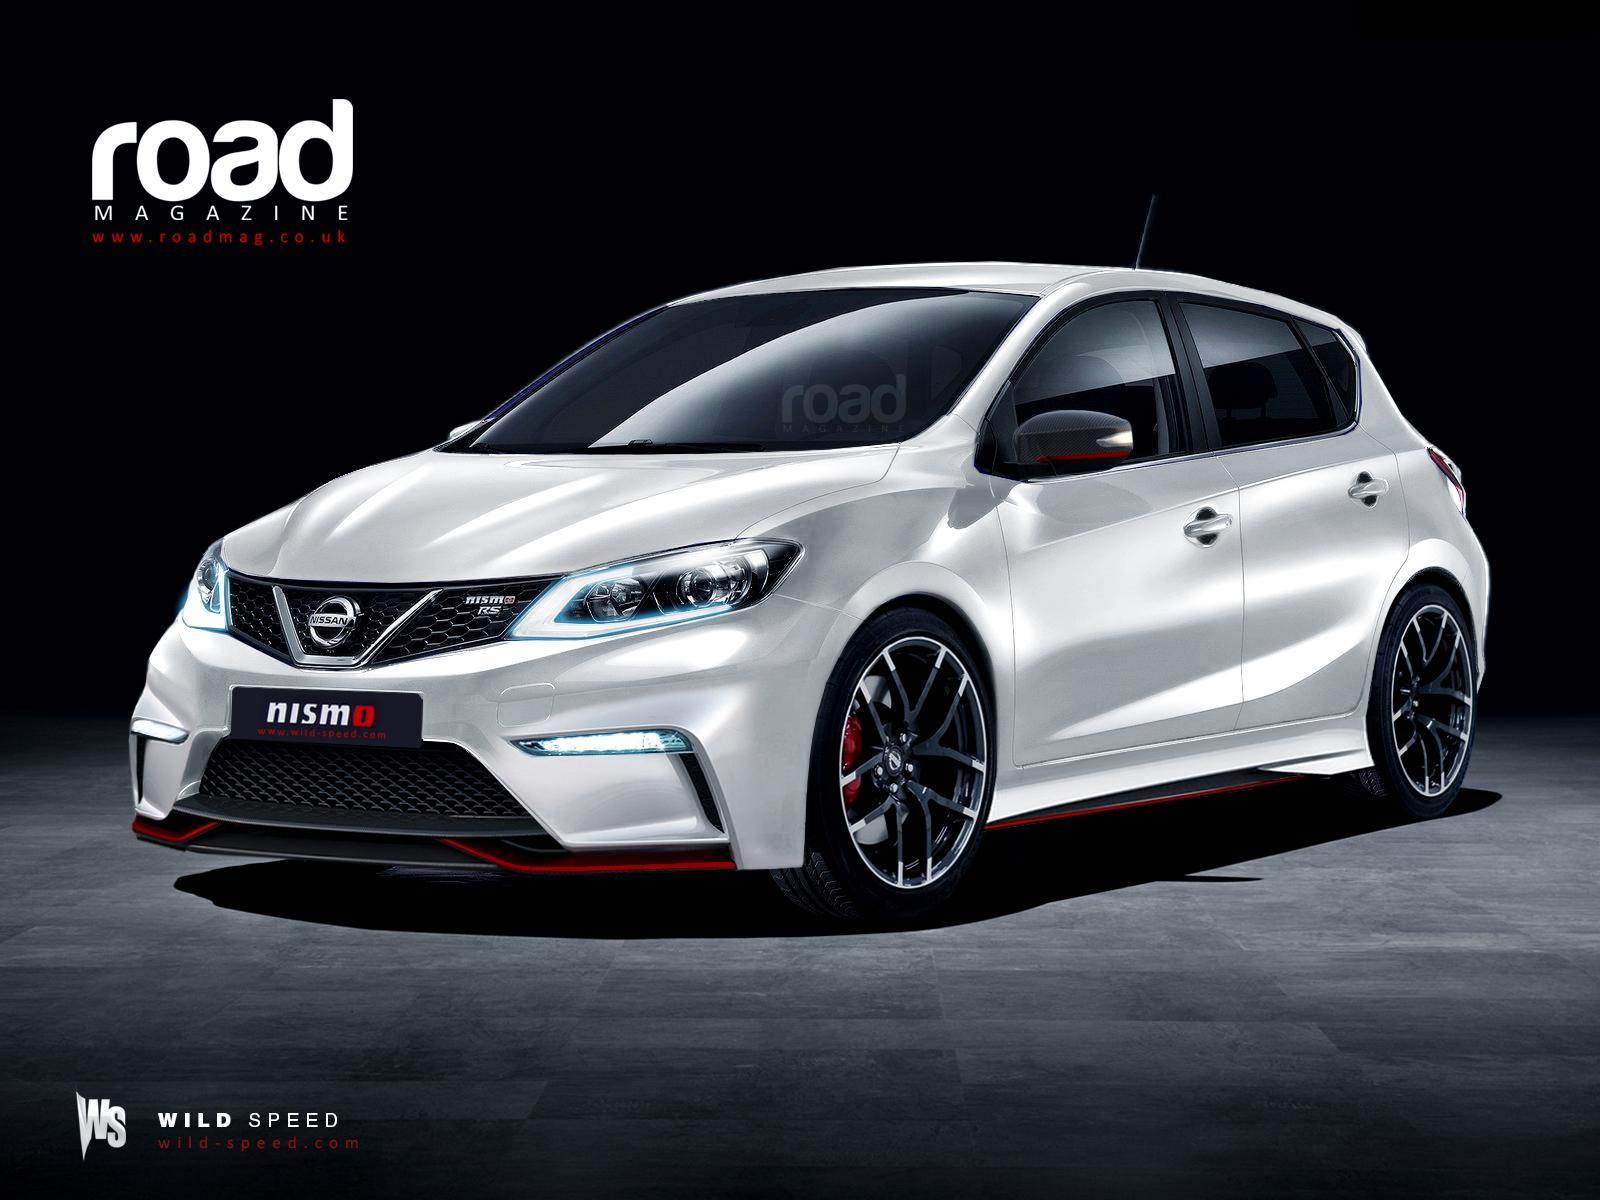 Nissan Pulsar Nismo RS – Wild Speed